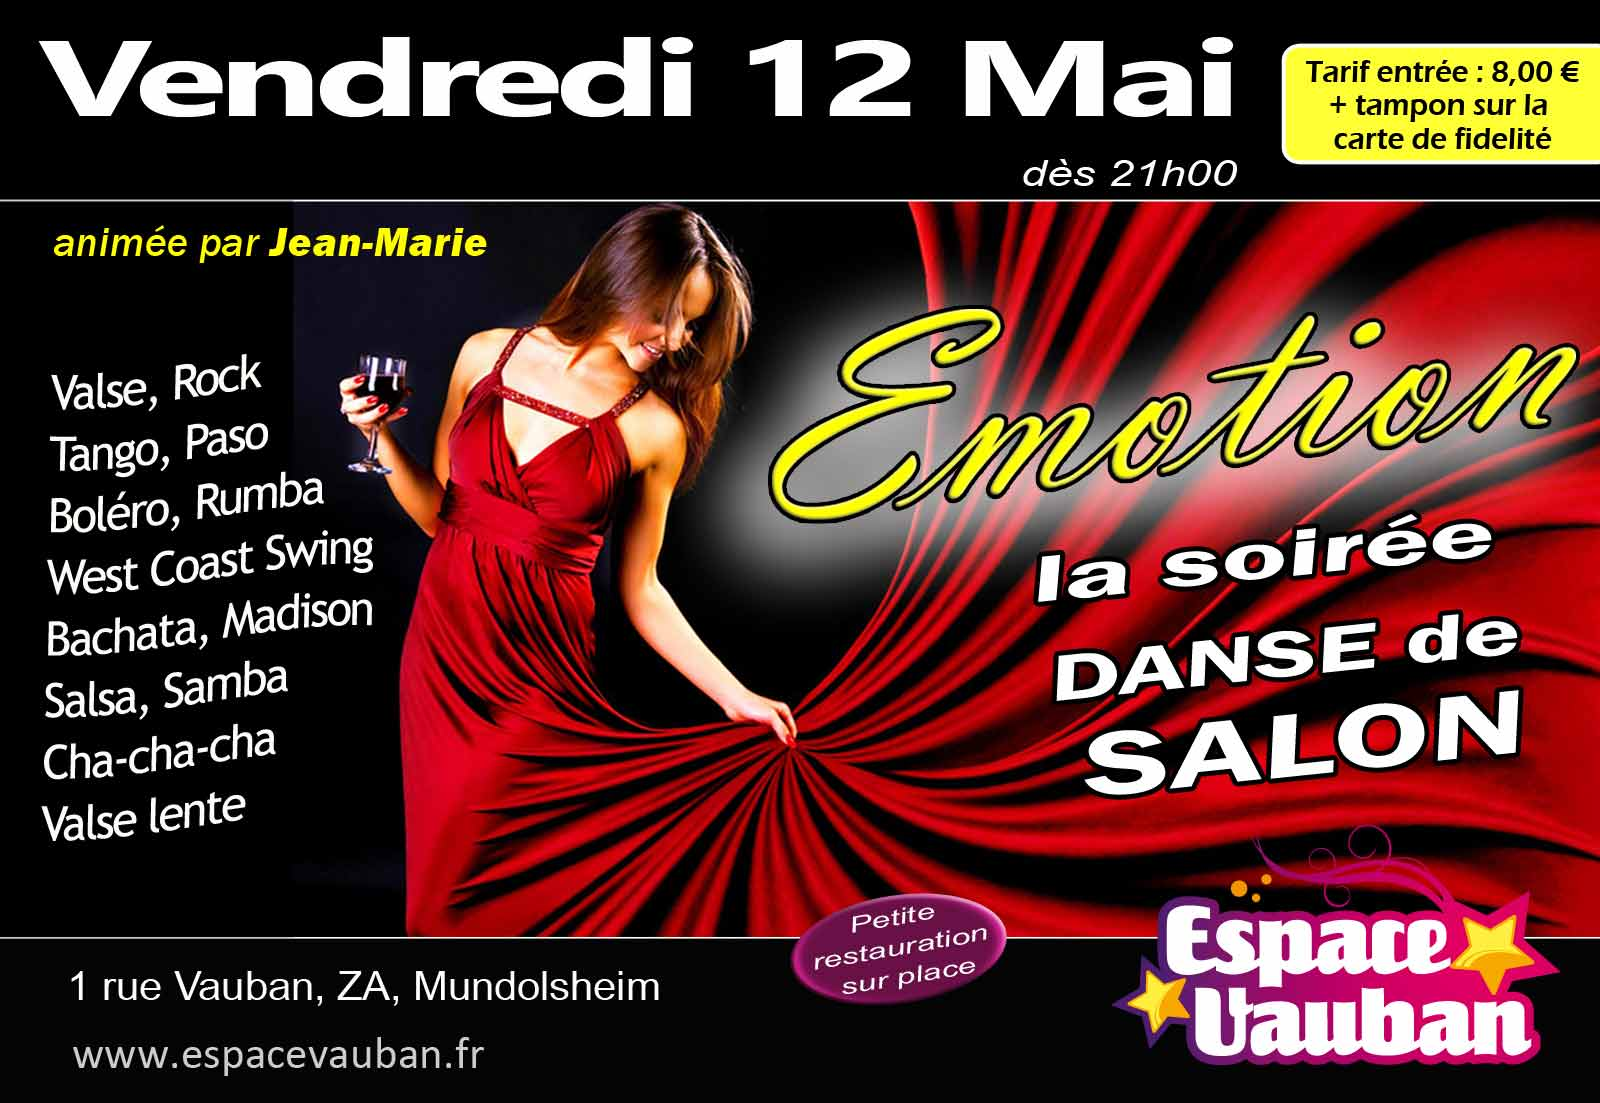 Emotion danse de salon avec jean marie espace vauban for Jean marie salon